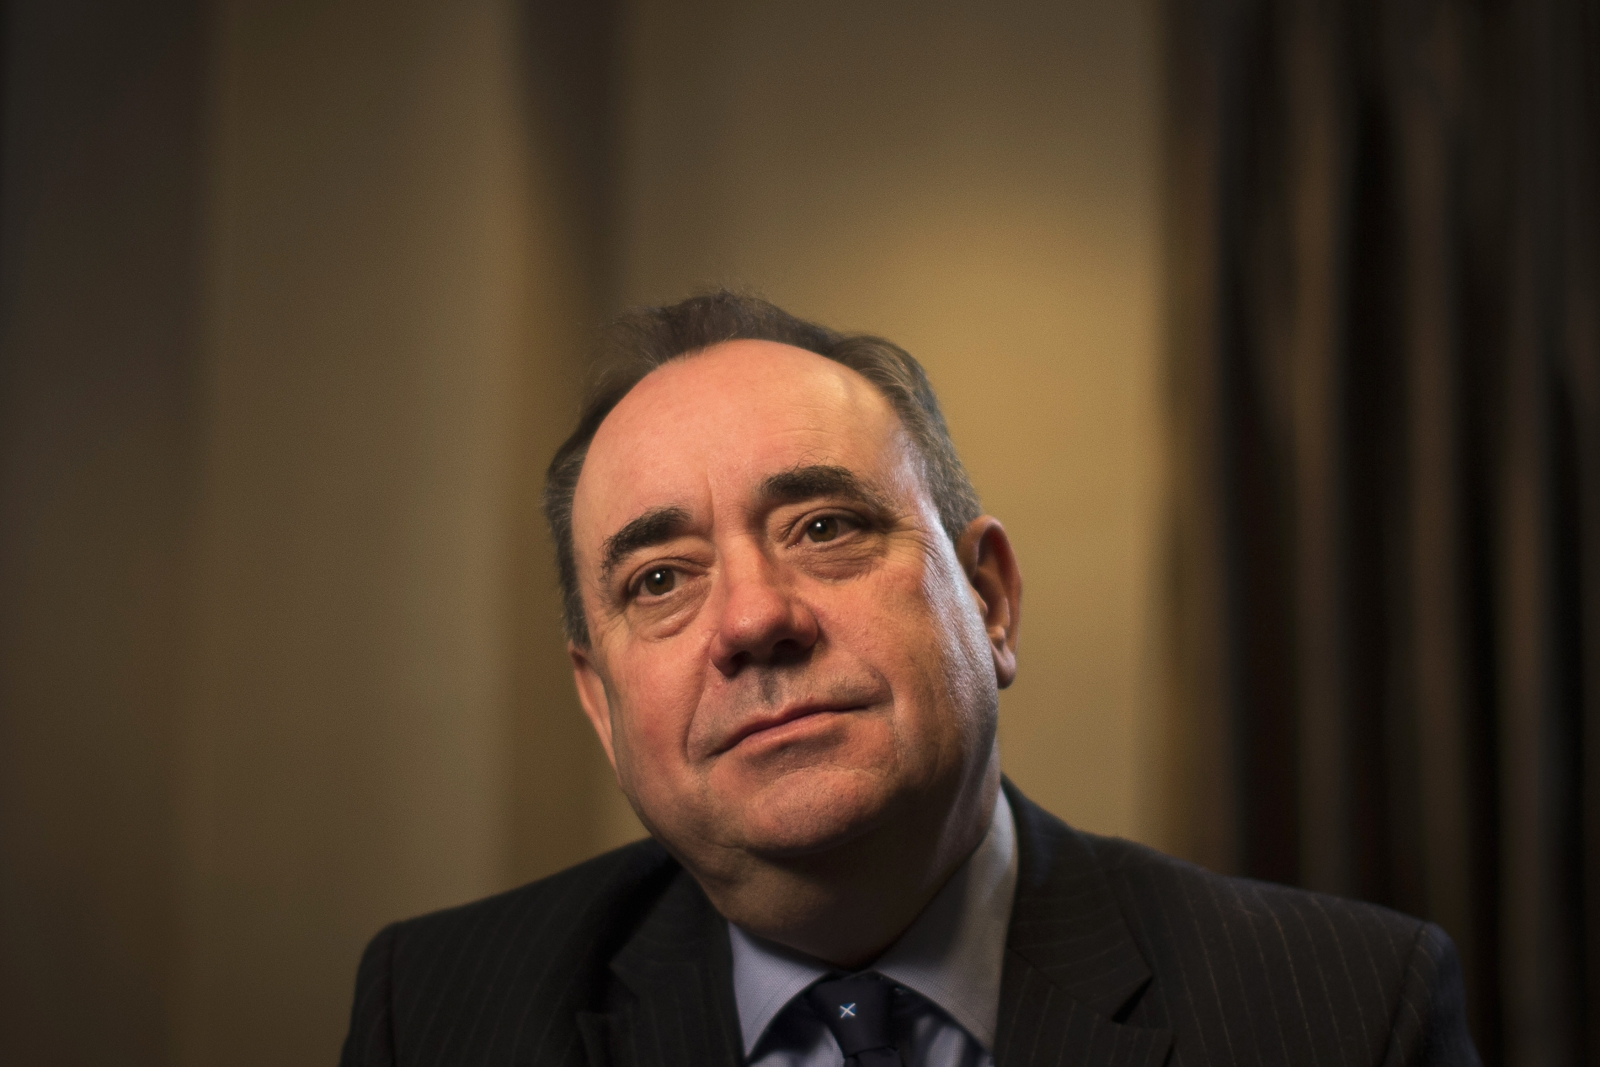 First Minister of Scotland Alex Salmond